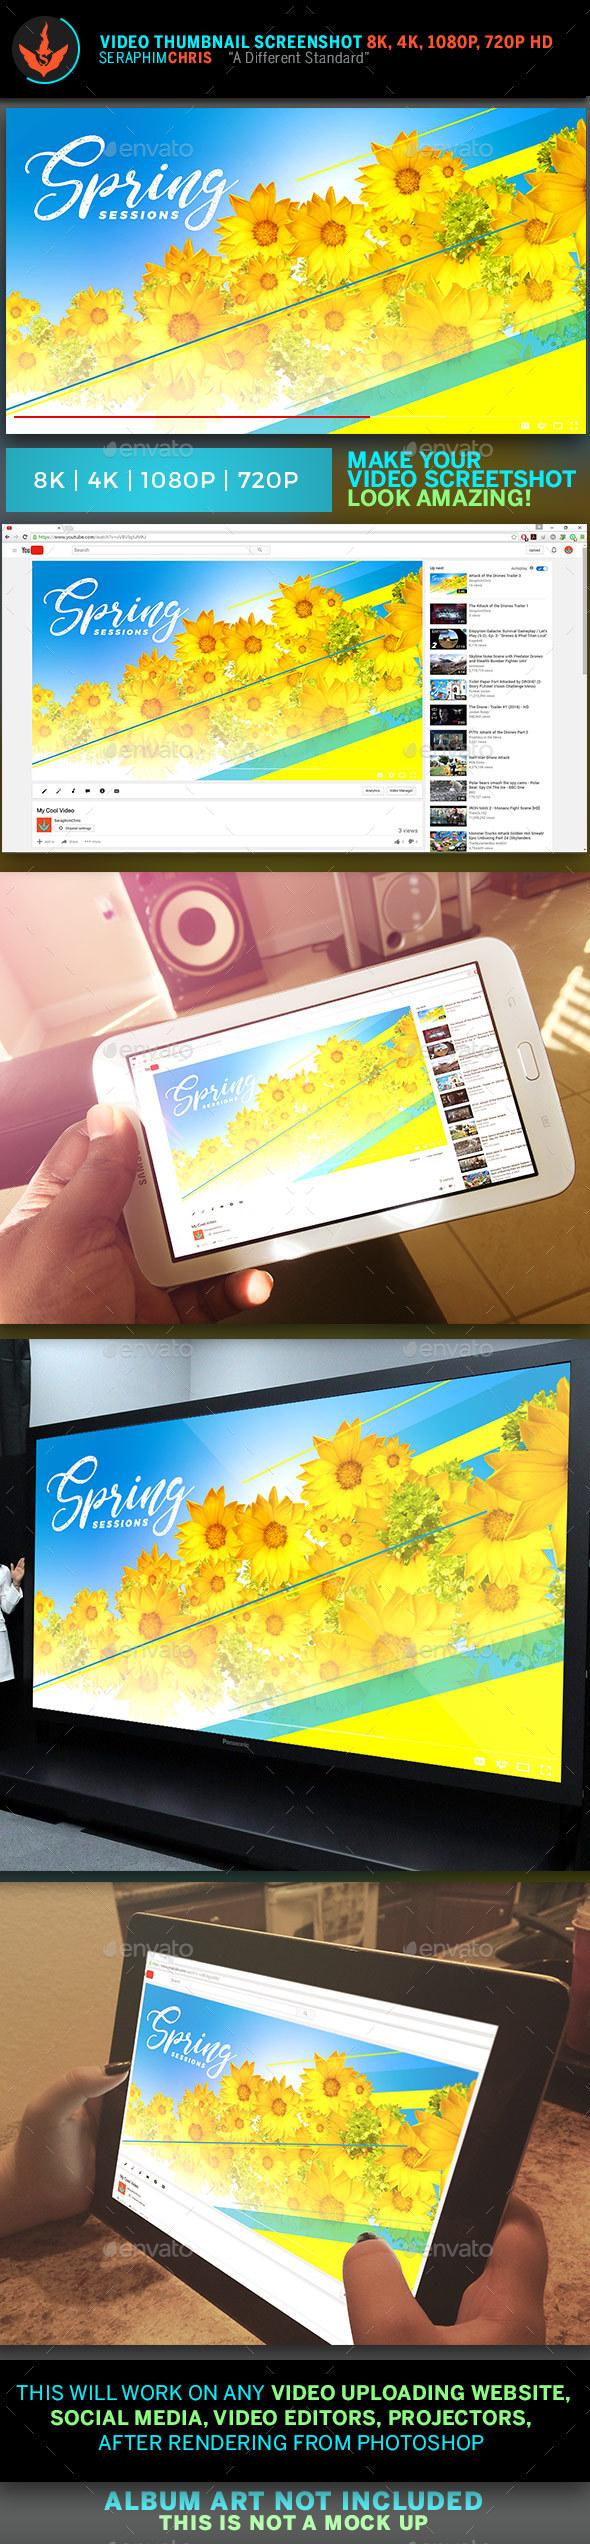 GraphicRiver Spring Break YouTube Video Artwork Template 20765674